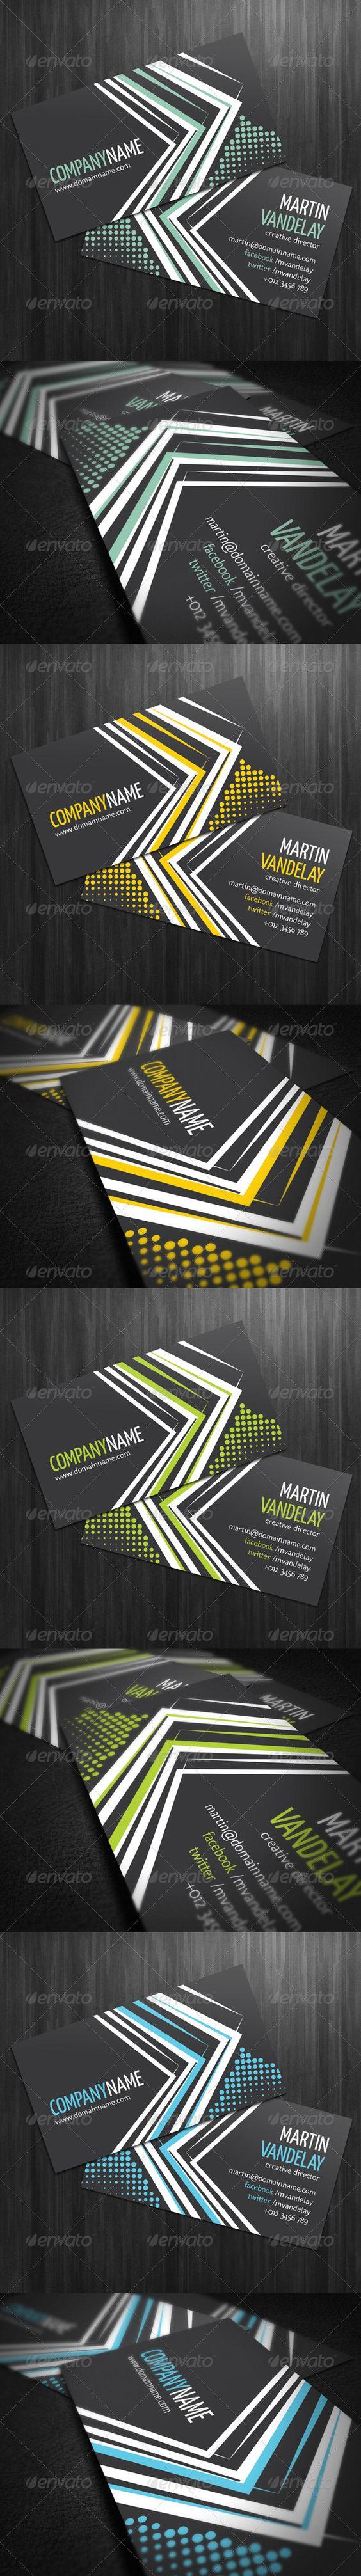 halftone corporate business card lemon graphic